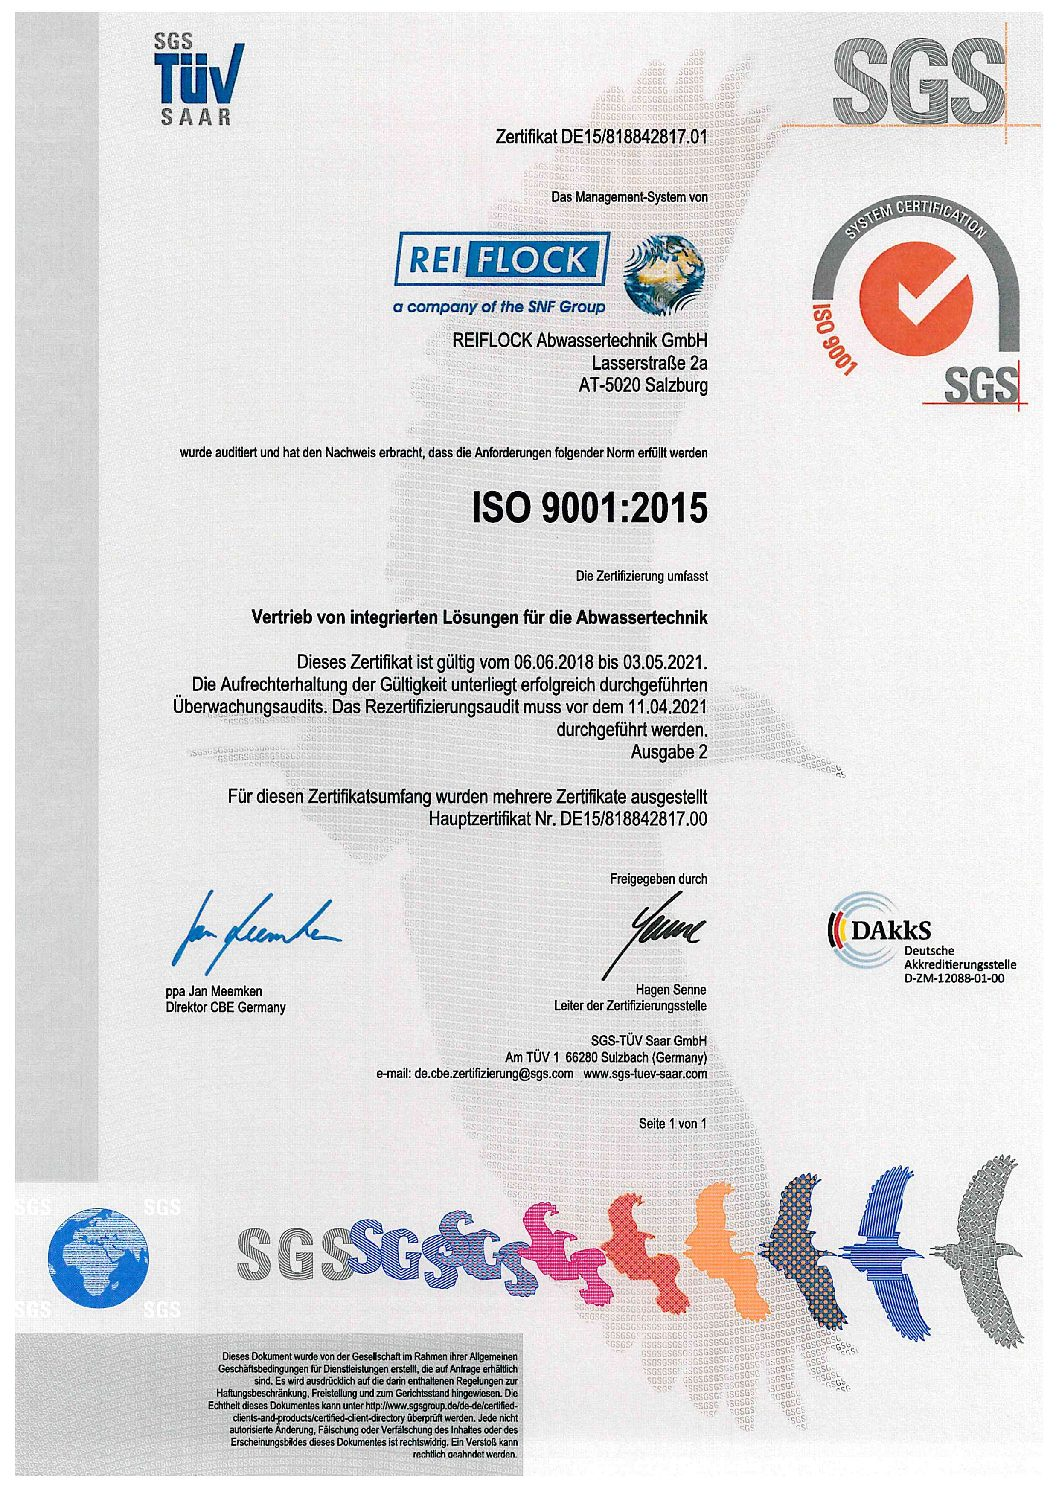 ISO-Zertifikat REIFLOCK Austria, DE 1 von 1 ab 2018